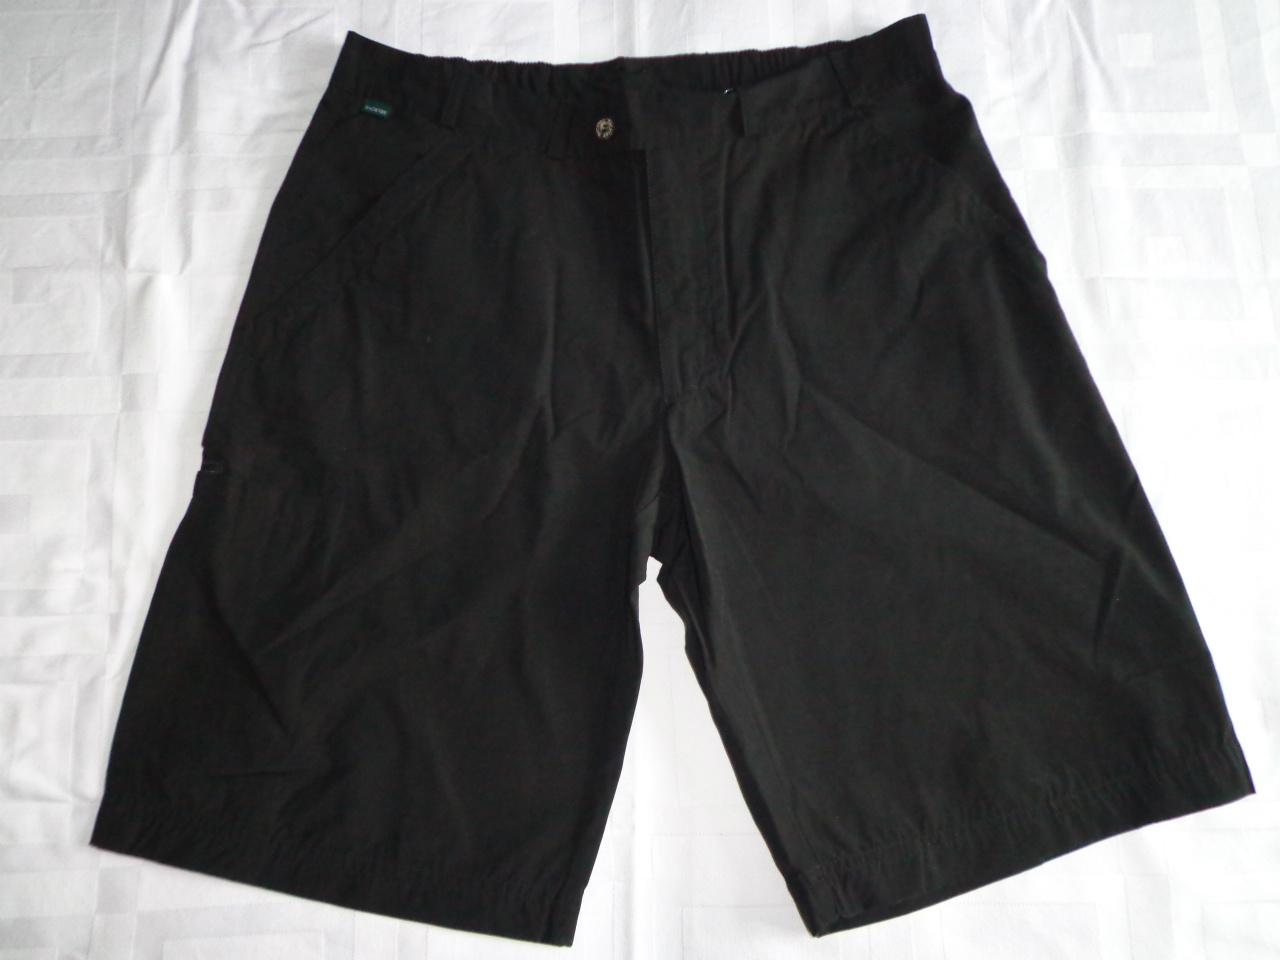 BackTee shorts i sort